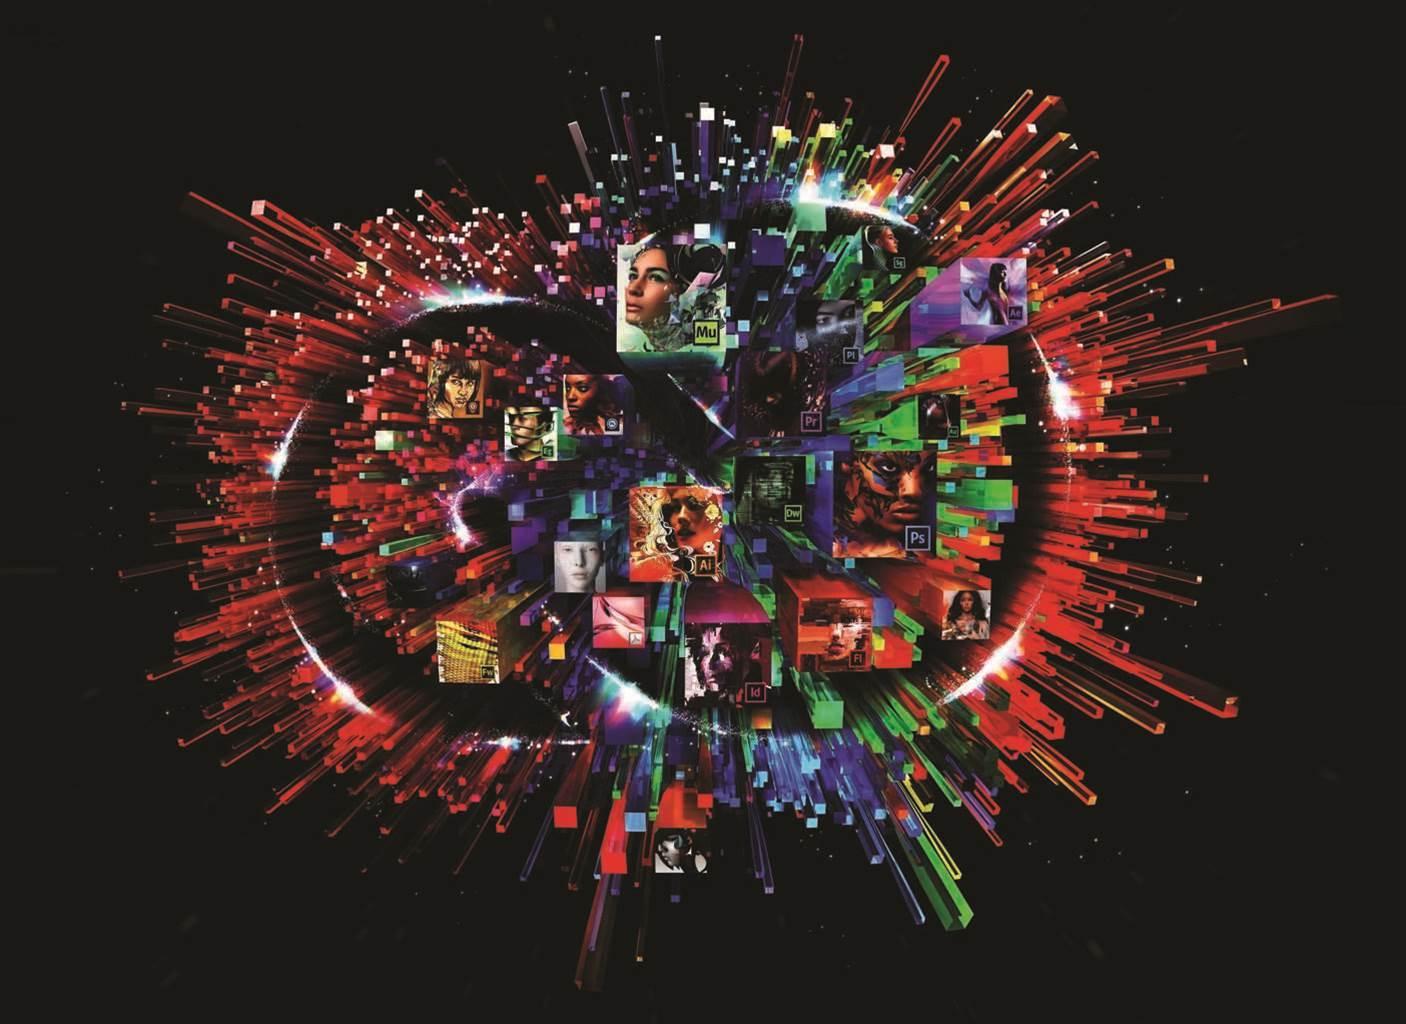 Review: Adobe Creative Cloud